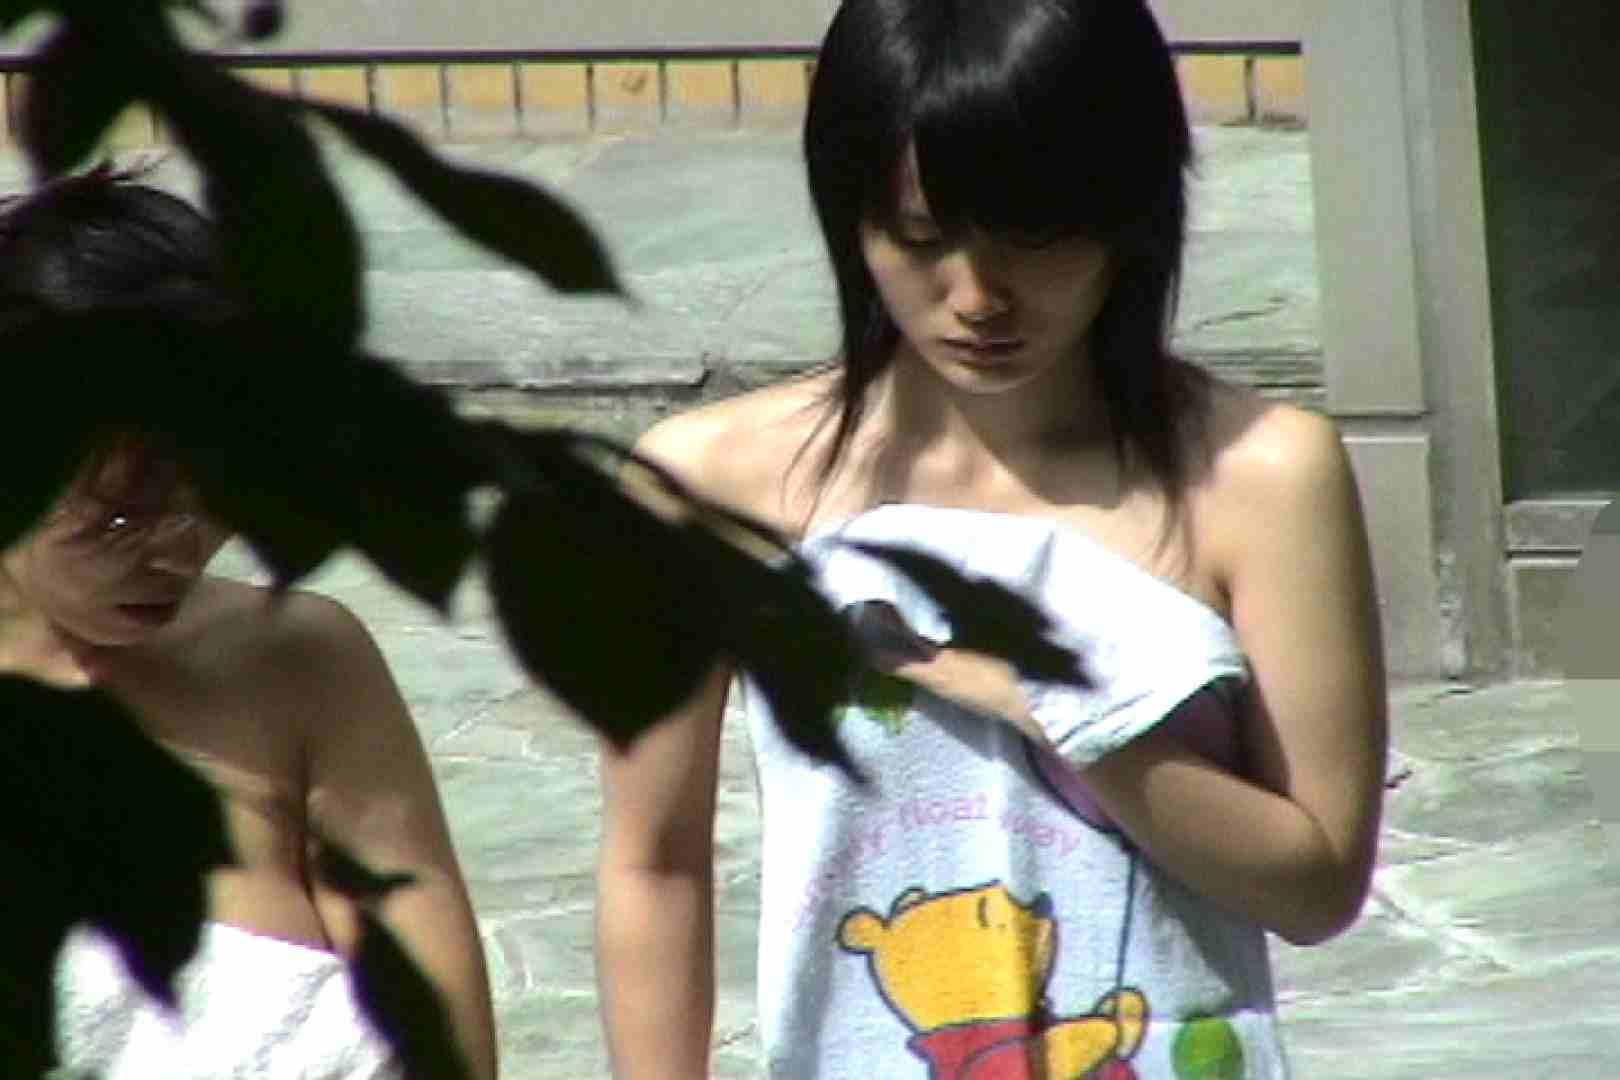 No.20 薄めの陰毛にズーム 桃色乳首 エロ画像 110枚 5